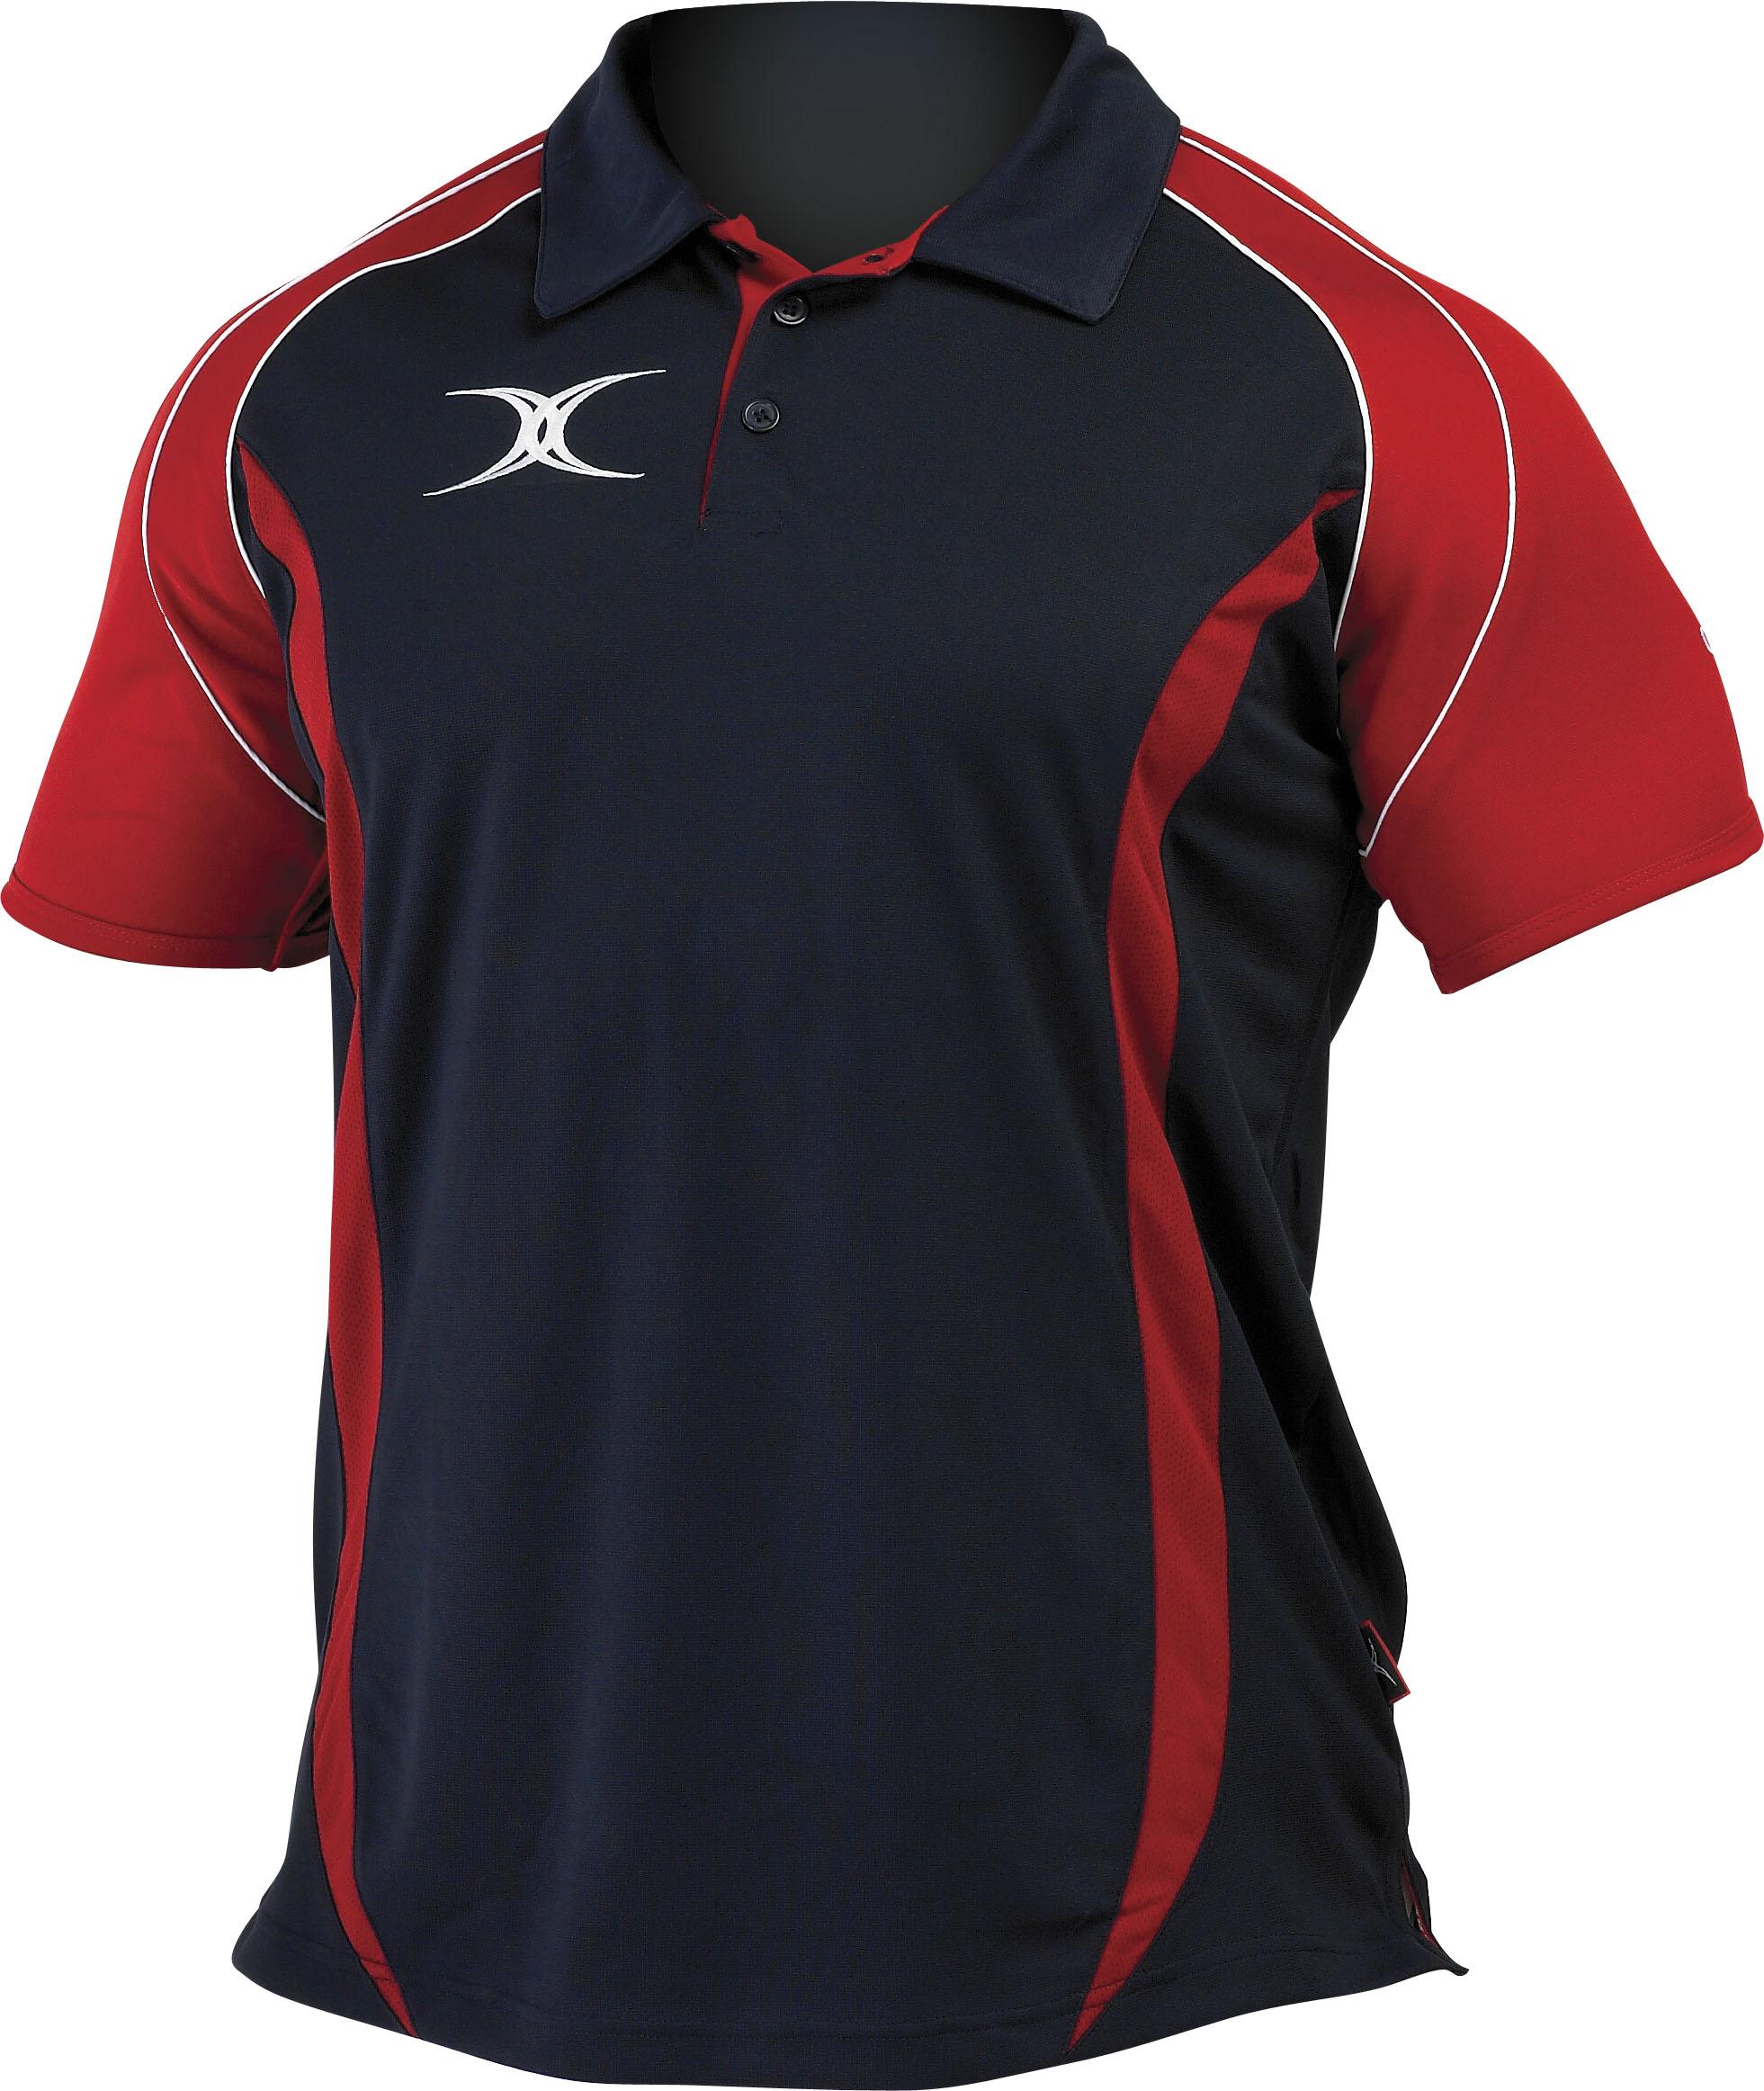 Design t shirt rugby - Gilbert Performance Tee Short Sleeve Technical Rugby Shirt